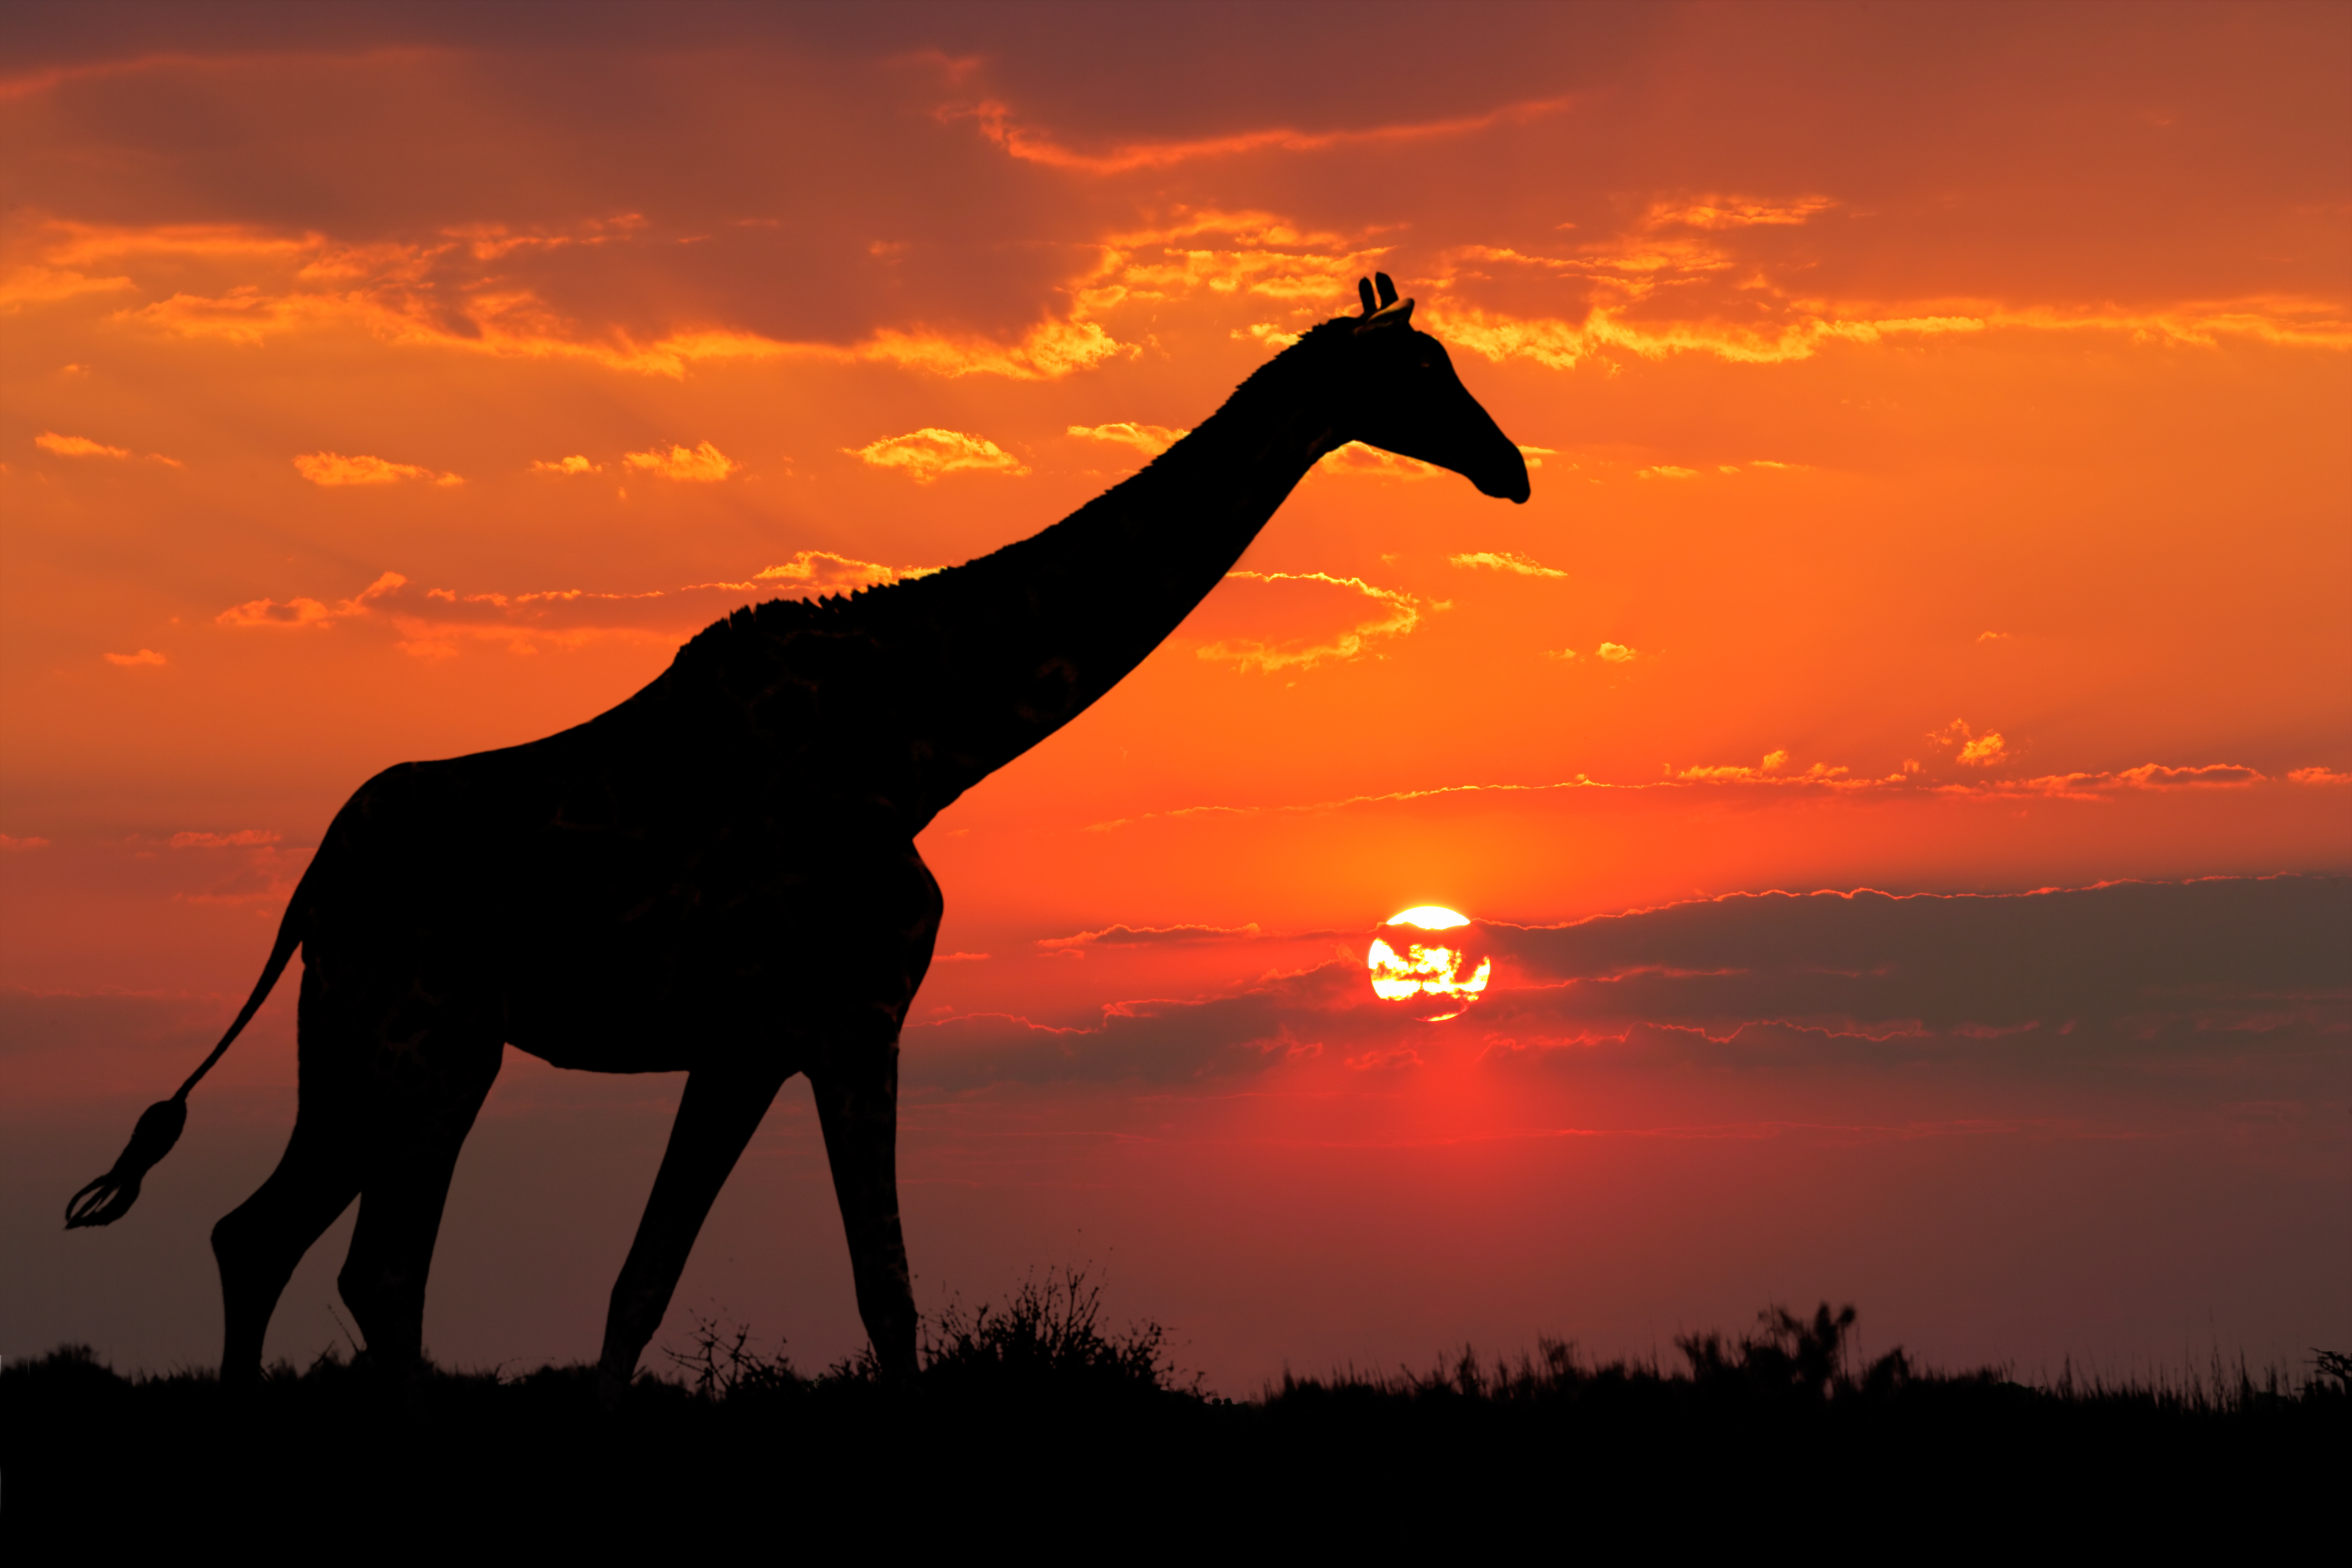 giraffe silhouette 1574938062 - Giraffe Silhouette -